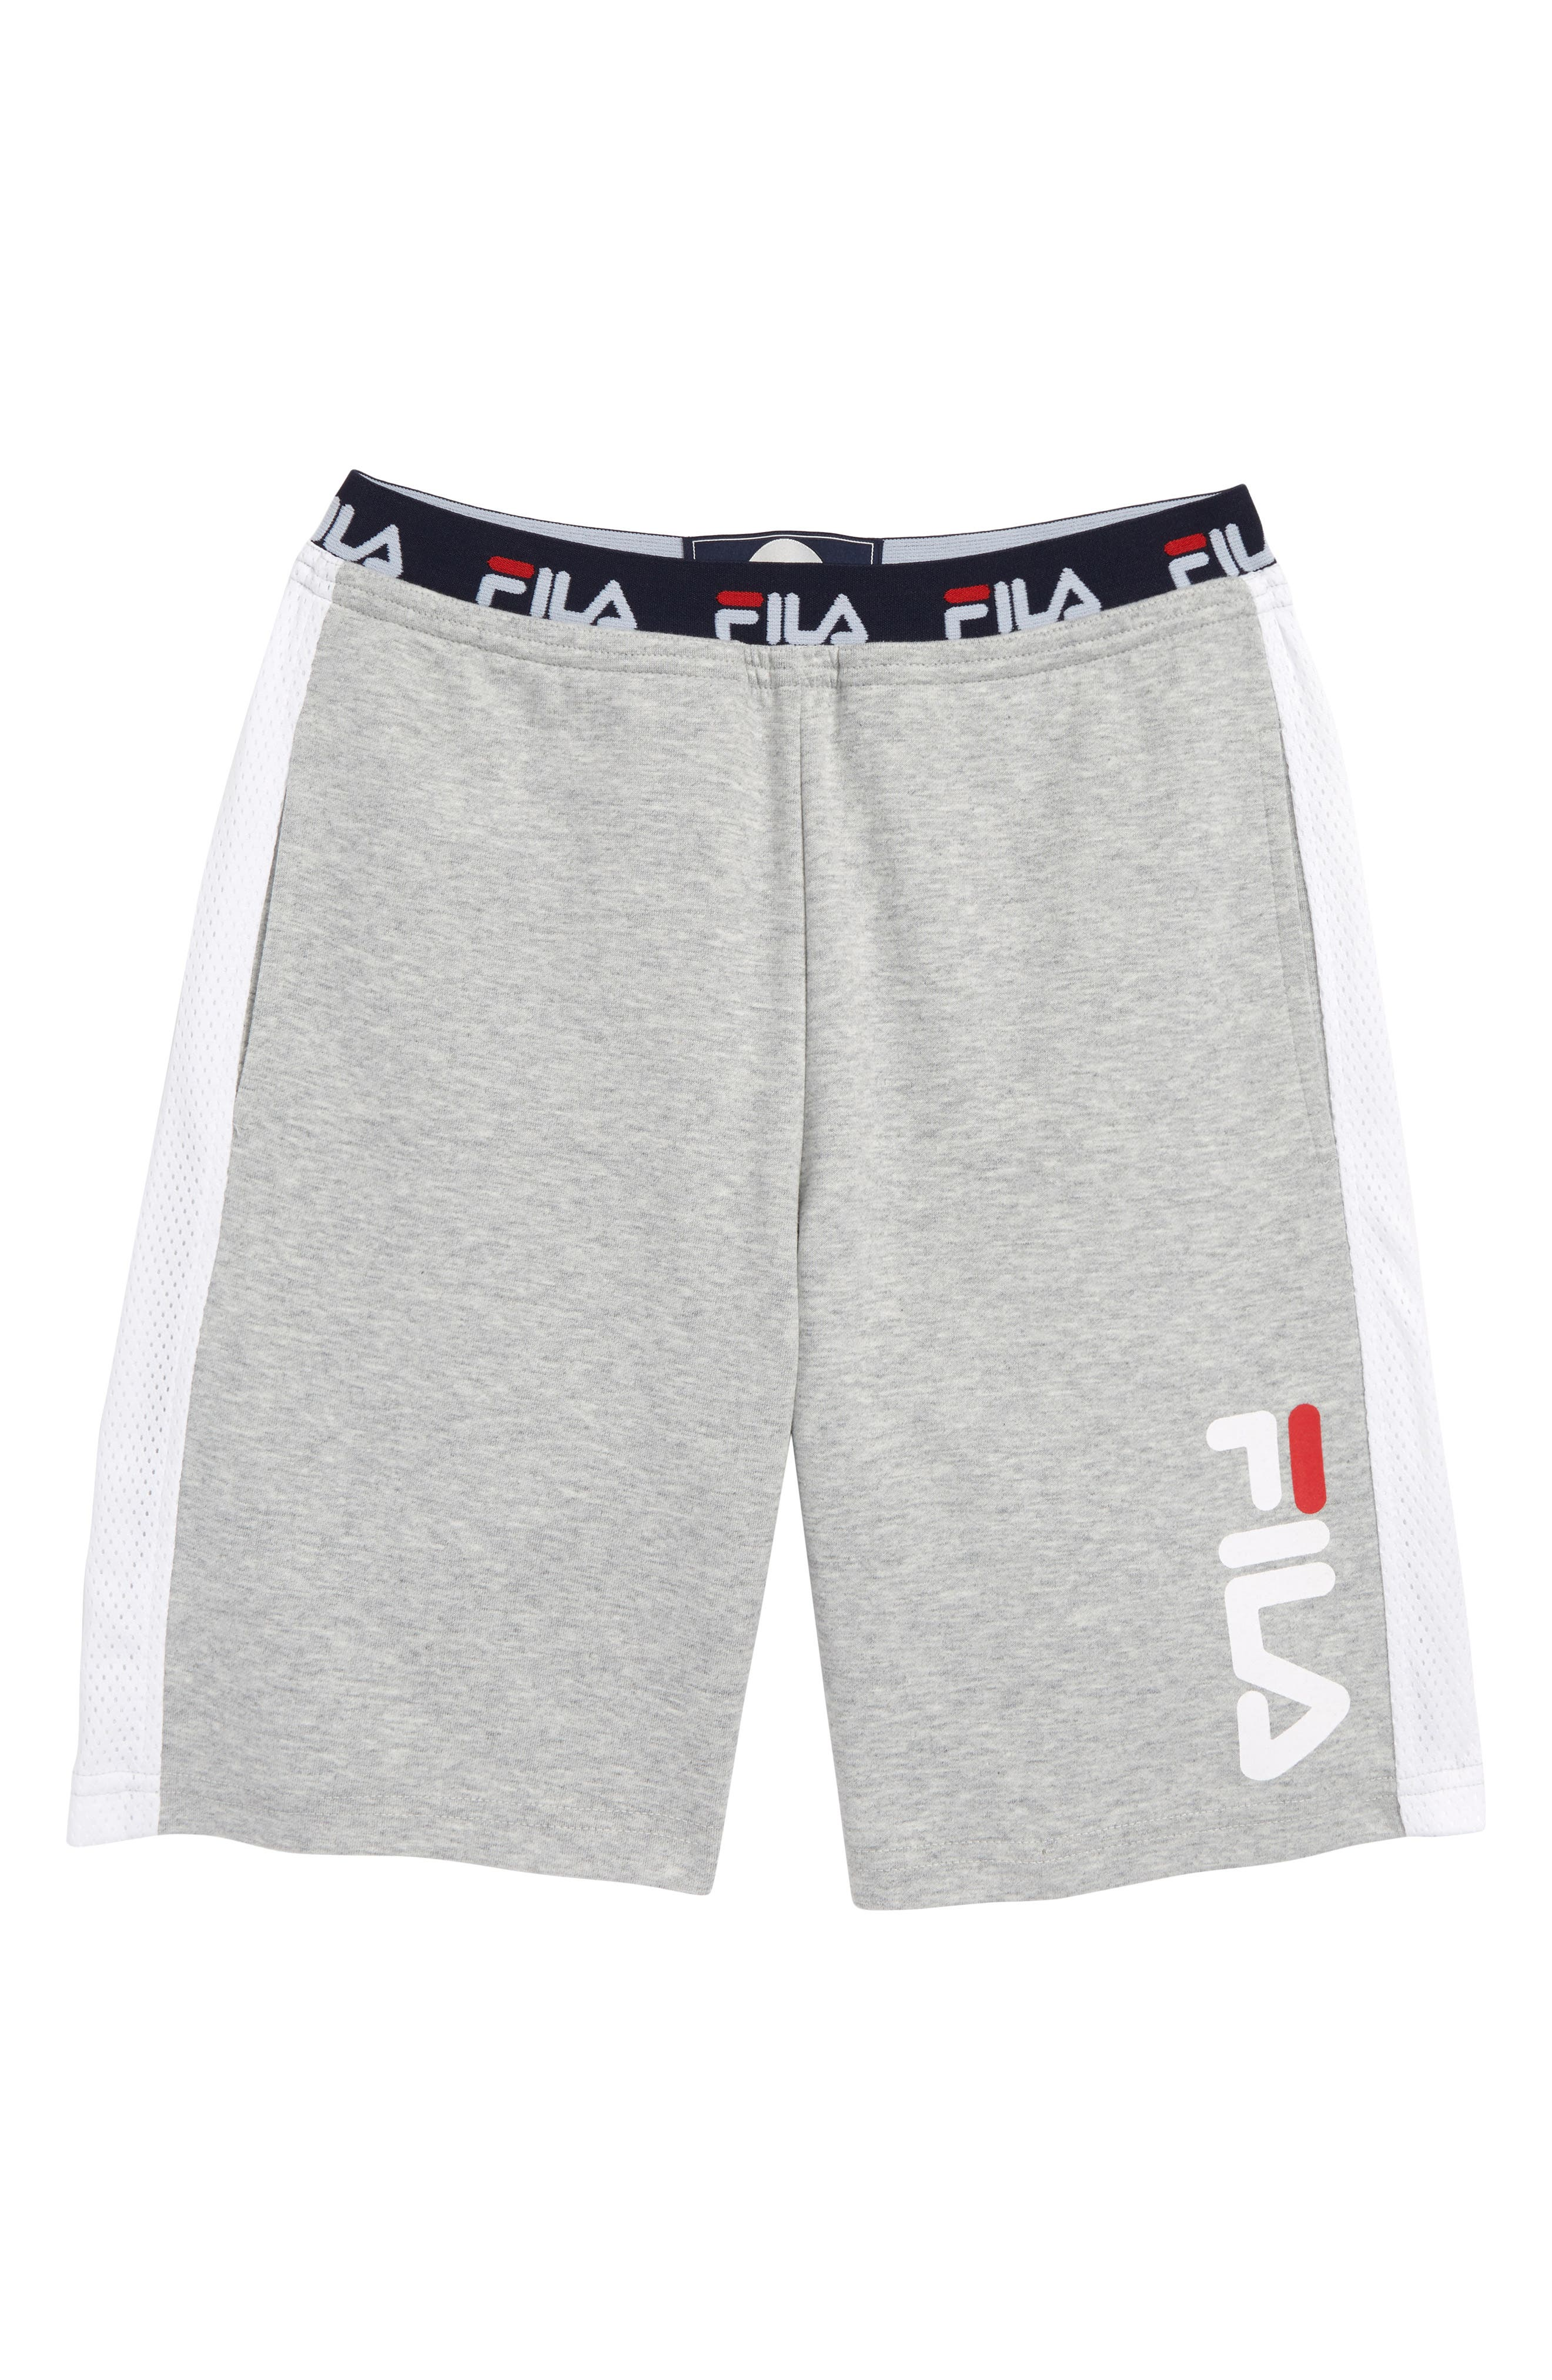 FILA Heritage Logo Sweat Shorts, Main, color, 050